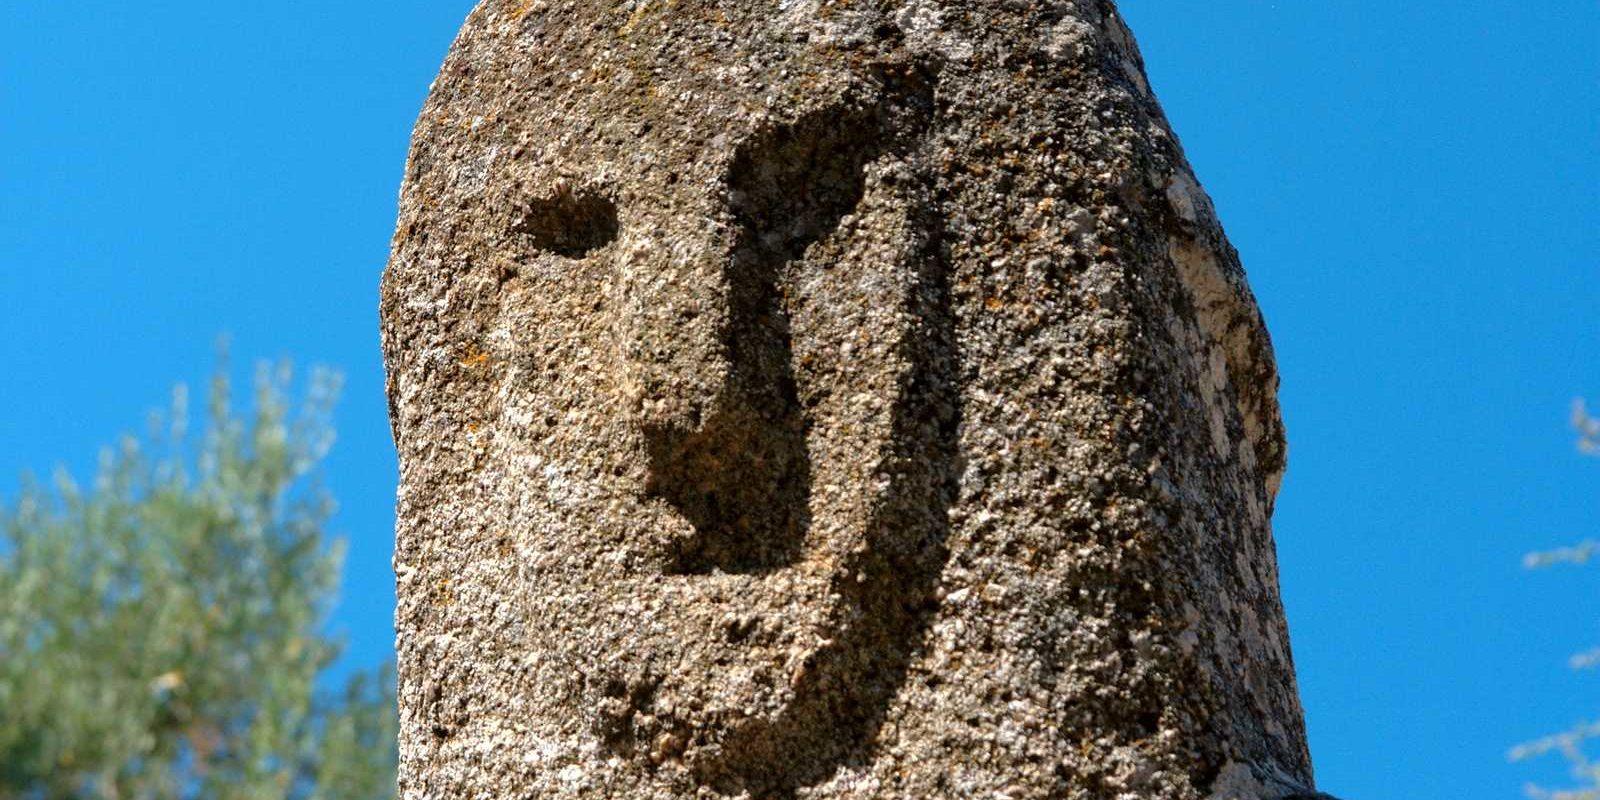 Filitosa Corsica Frankrijk menhir prehistorisch detail